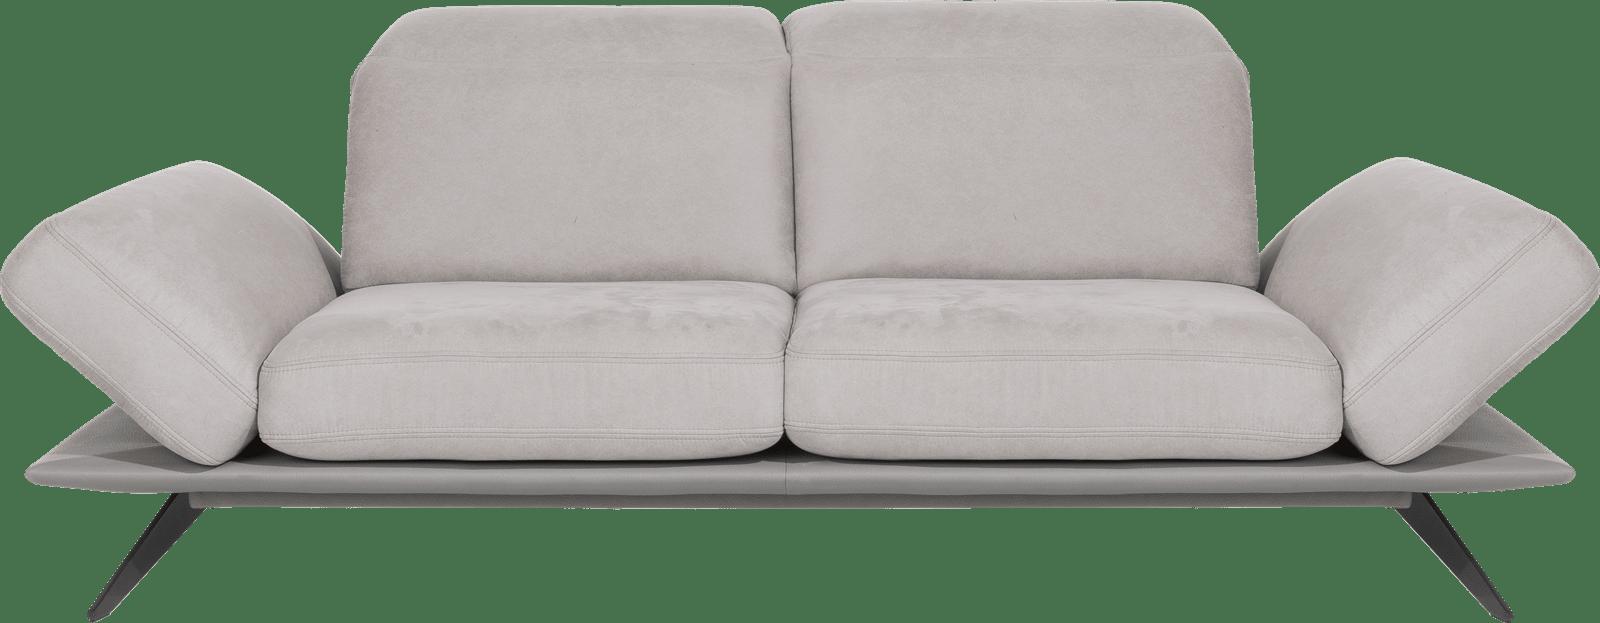 XOOON - Paxos - Design minimaliste - Canapes - 2.5-places